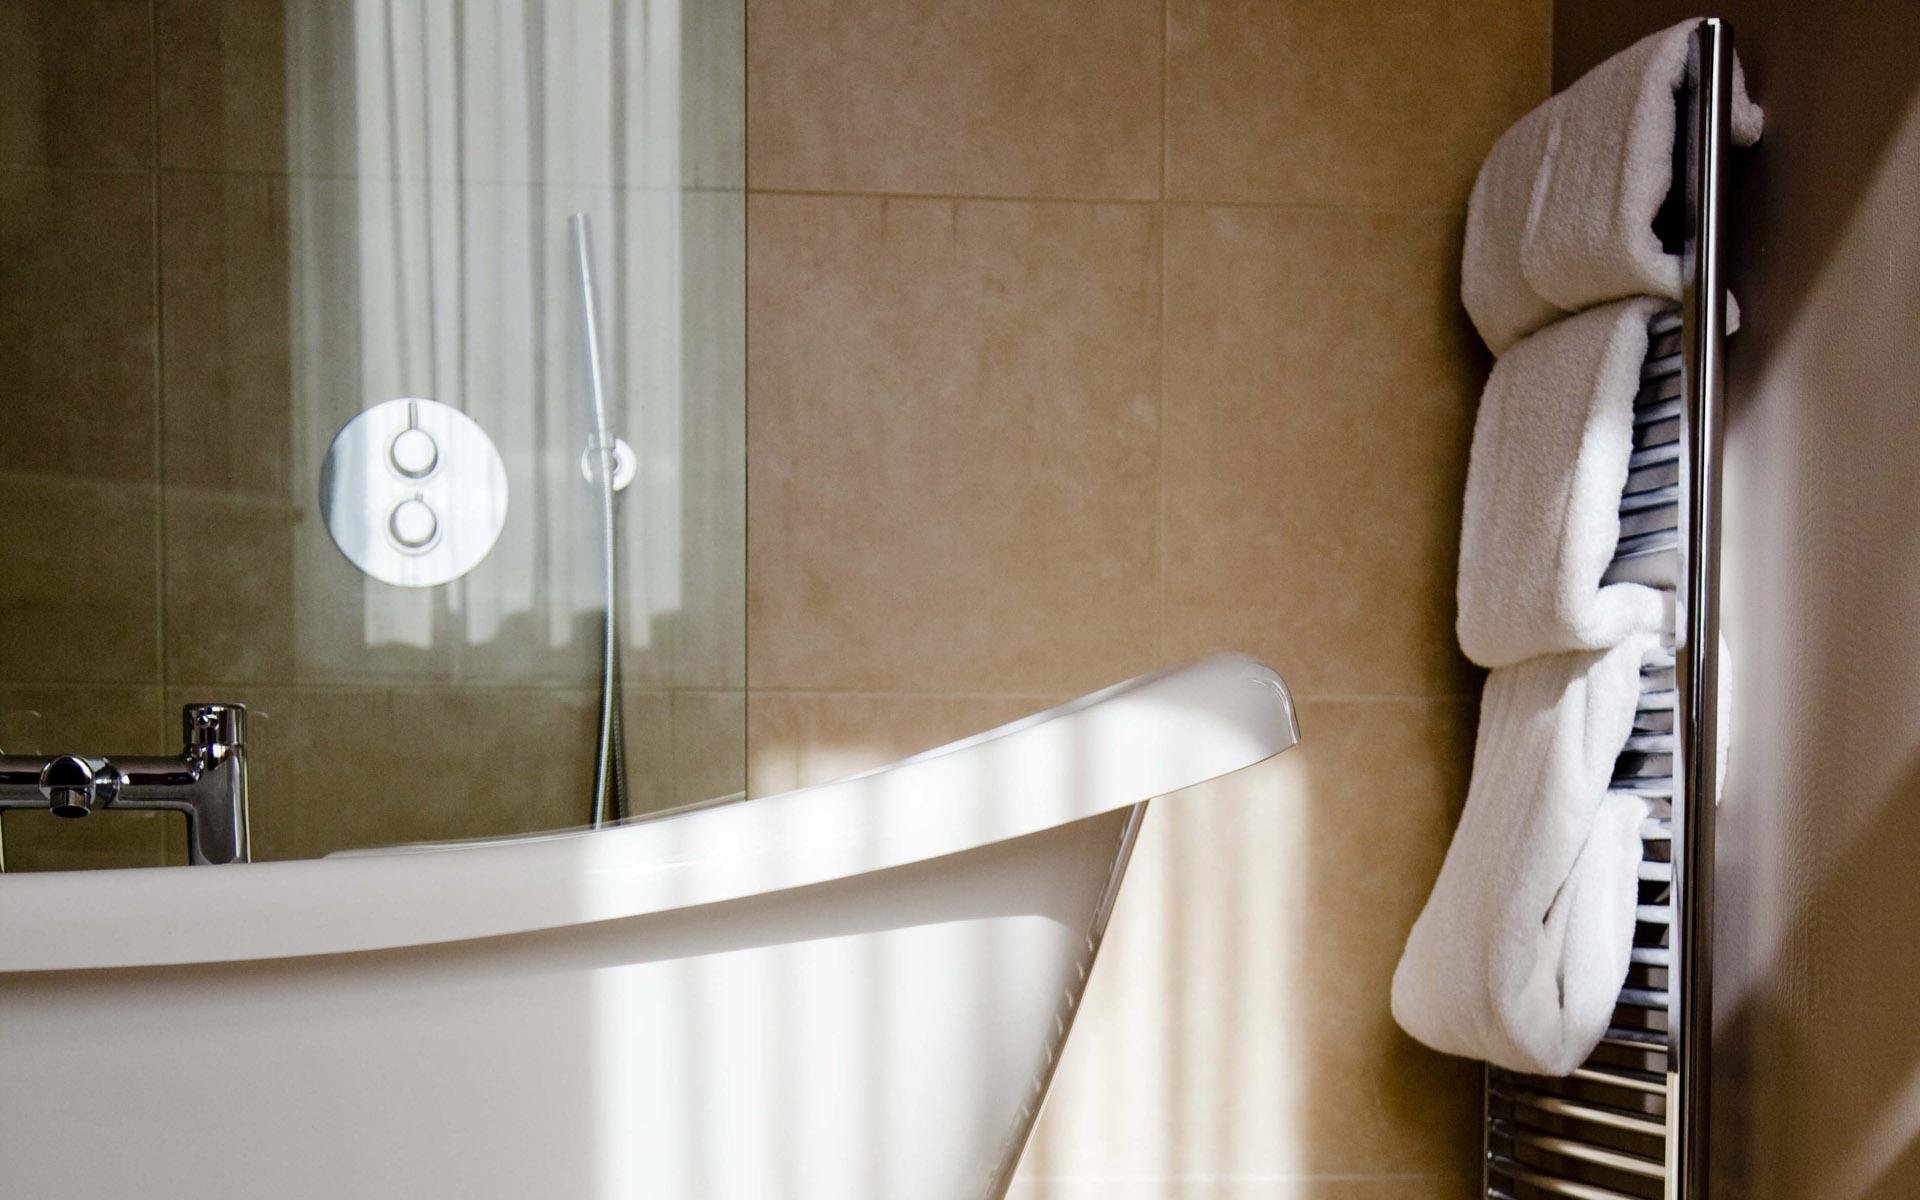 Bathroom_bathtub-and-towels Bathroom bathtub and towels